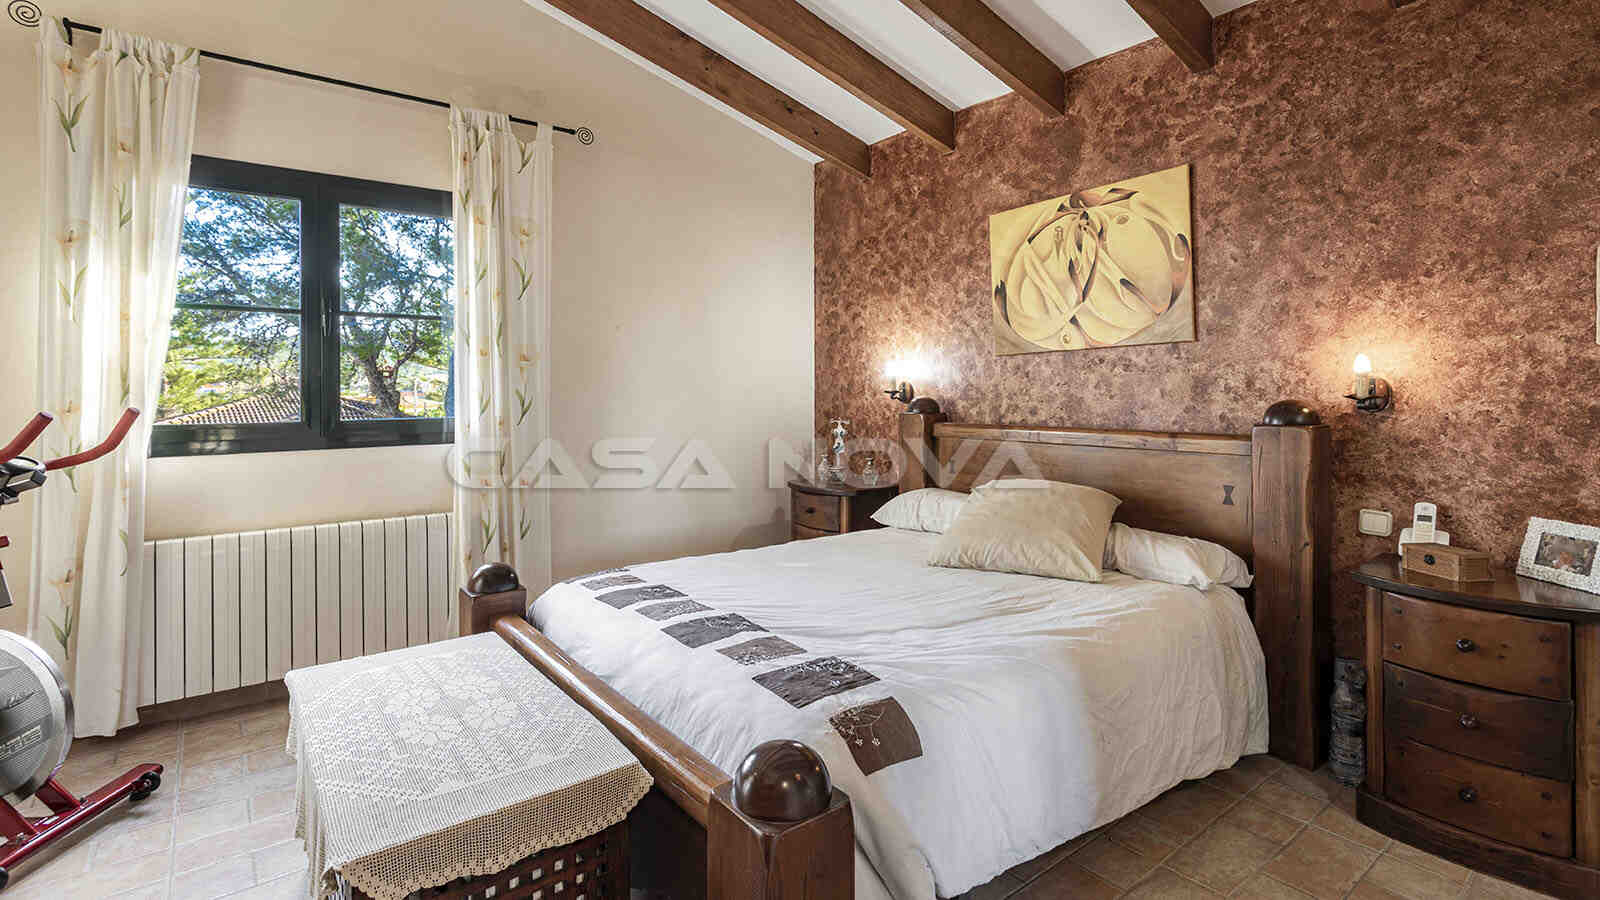 Grosses Schlafzimmer mit Holzbalkendecke